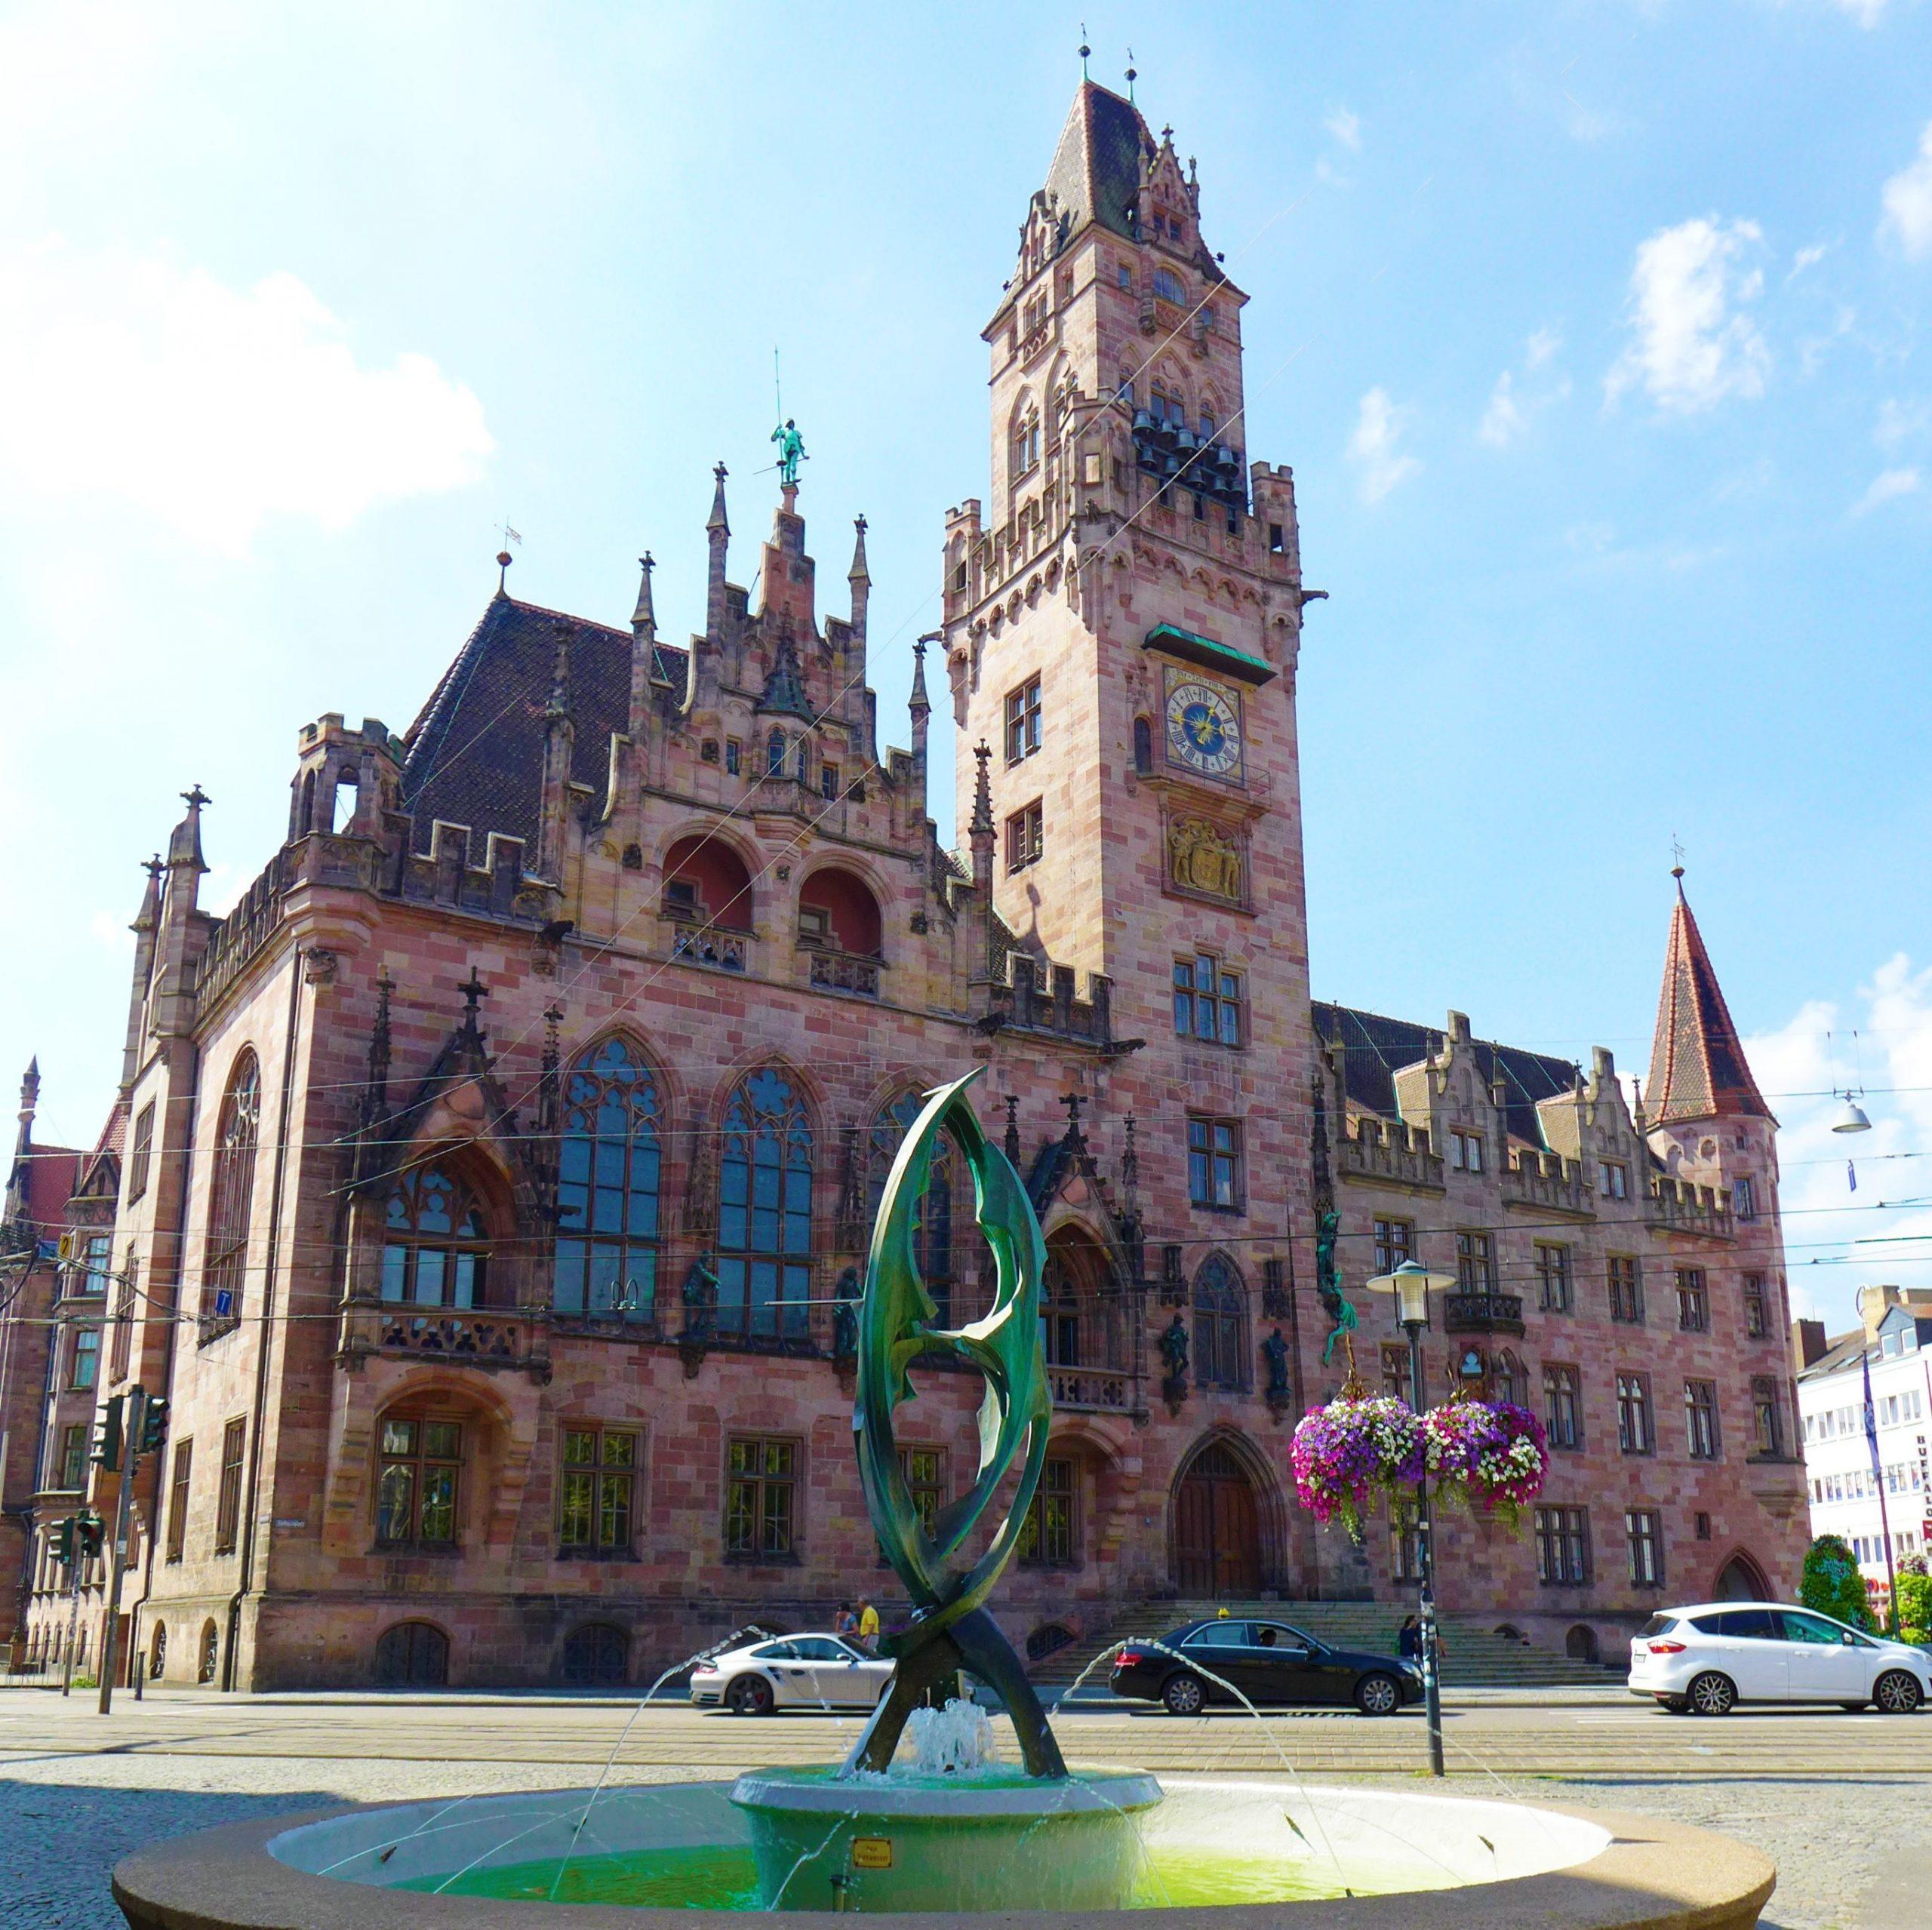 St. Johanner Markt & Rathaus